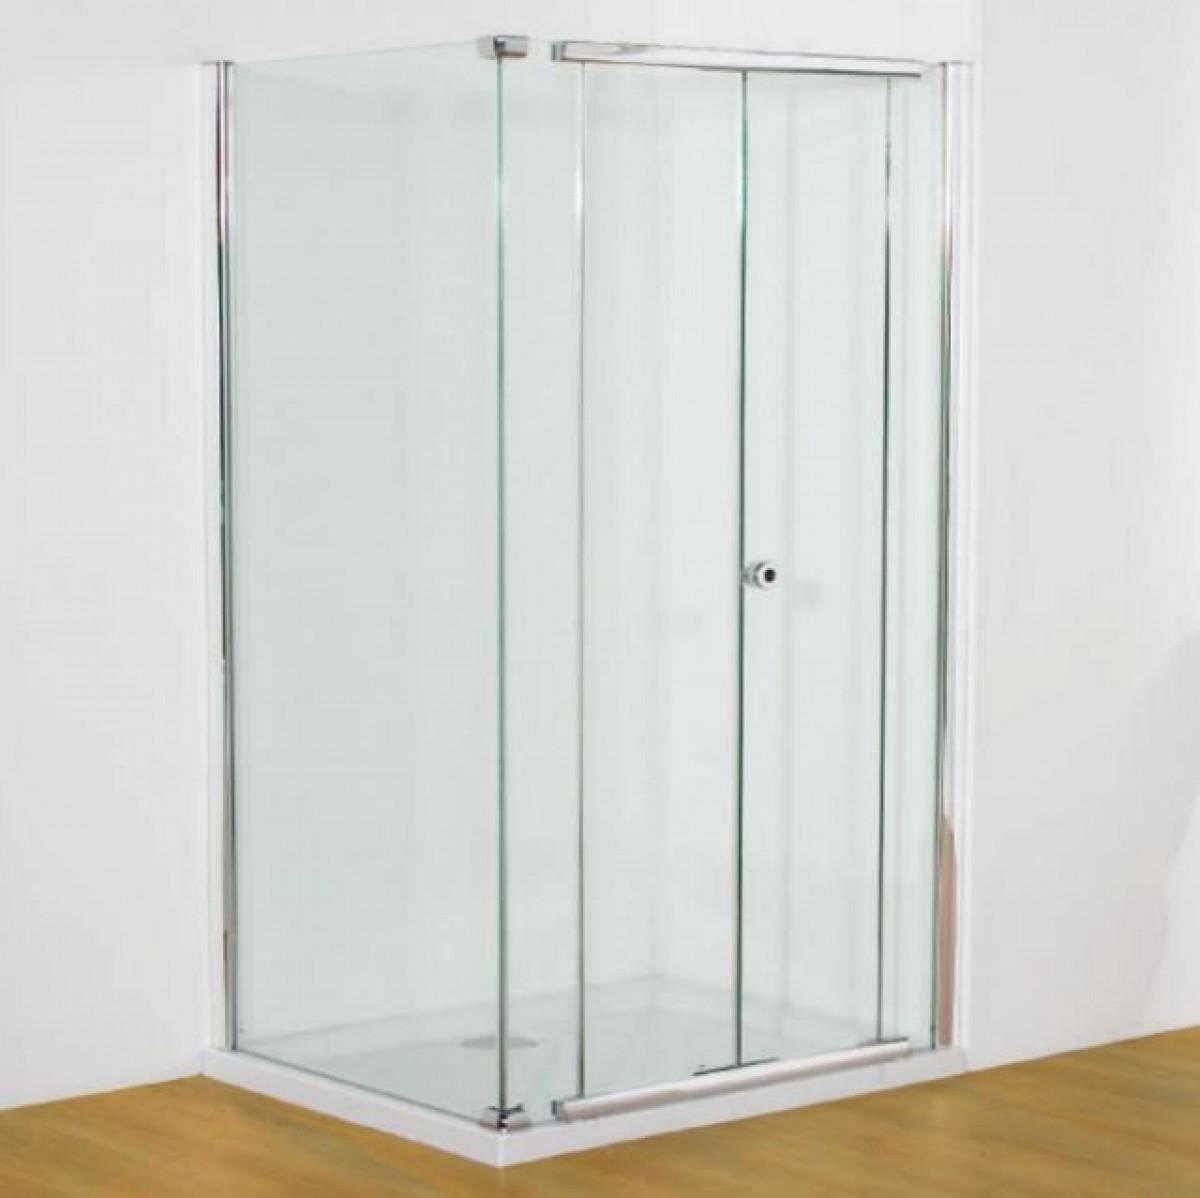 Kudos Infinite 1200mm Centre Folding Door Enclosure 4bf120s